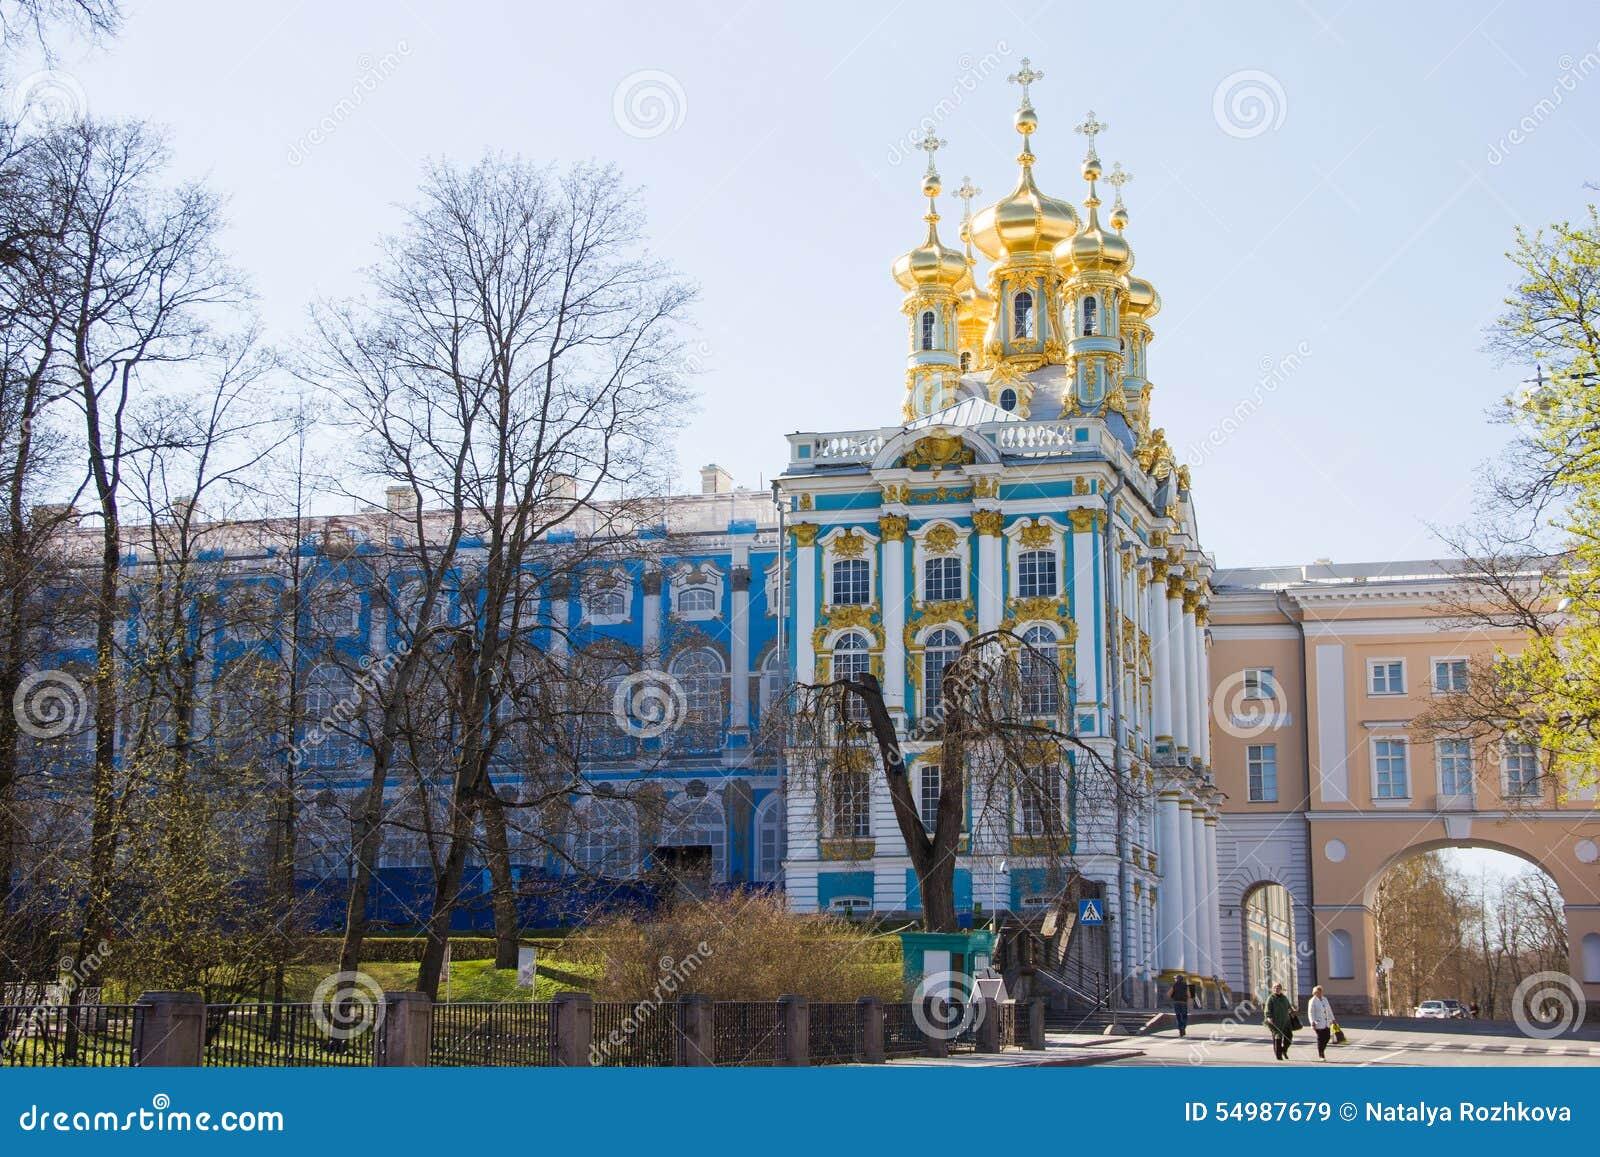 Tsarskoye Selo tsarskoe för st för catherine slottpetersburg russia selo